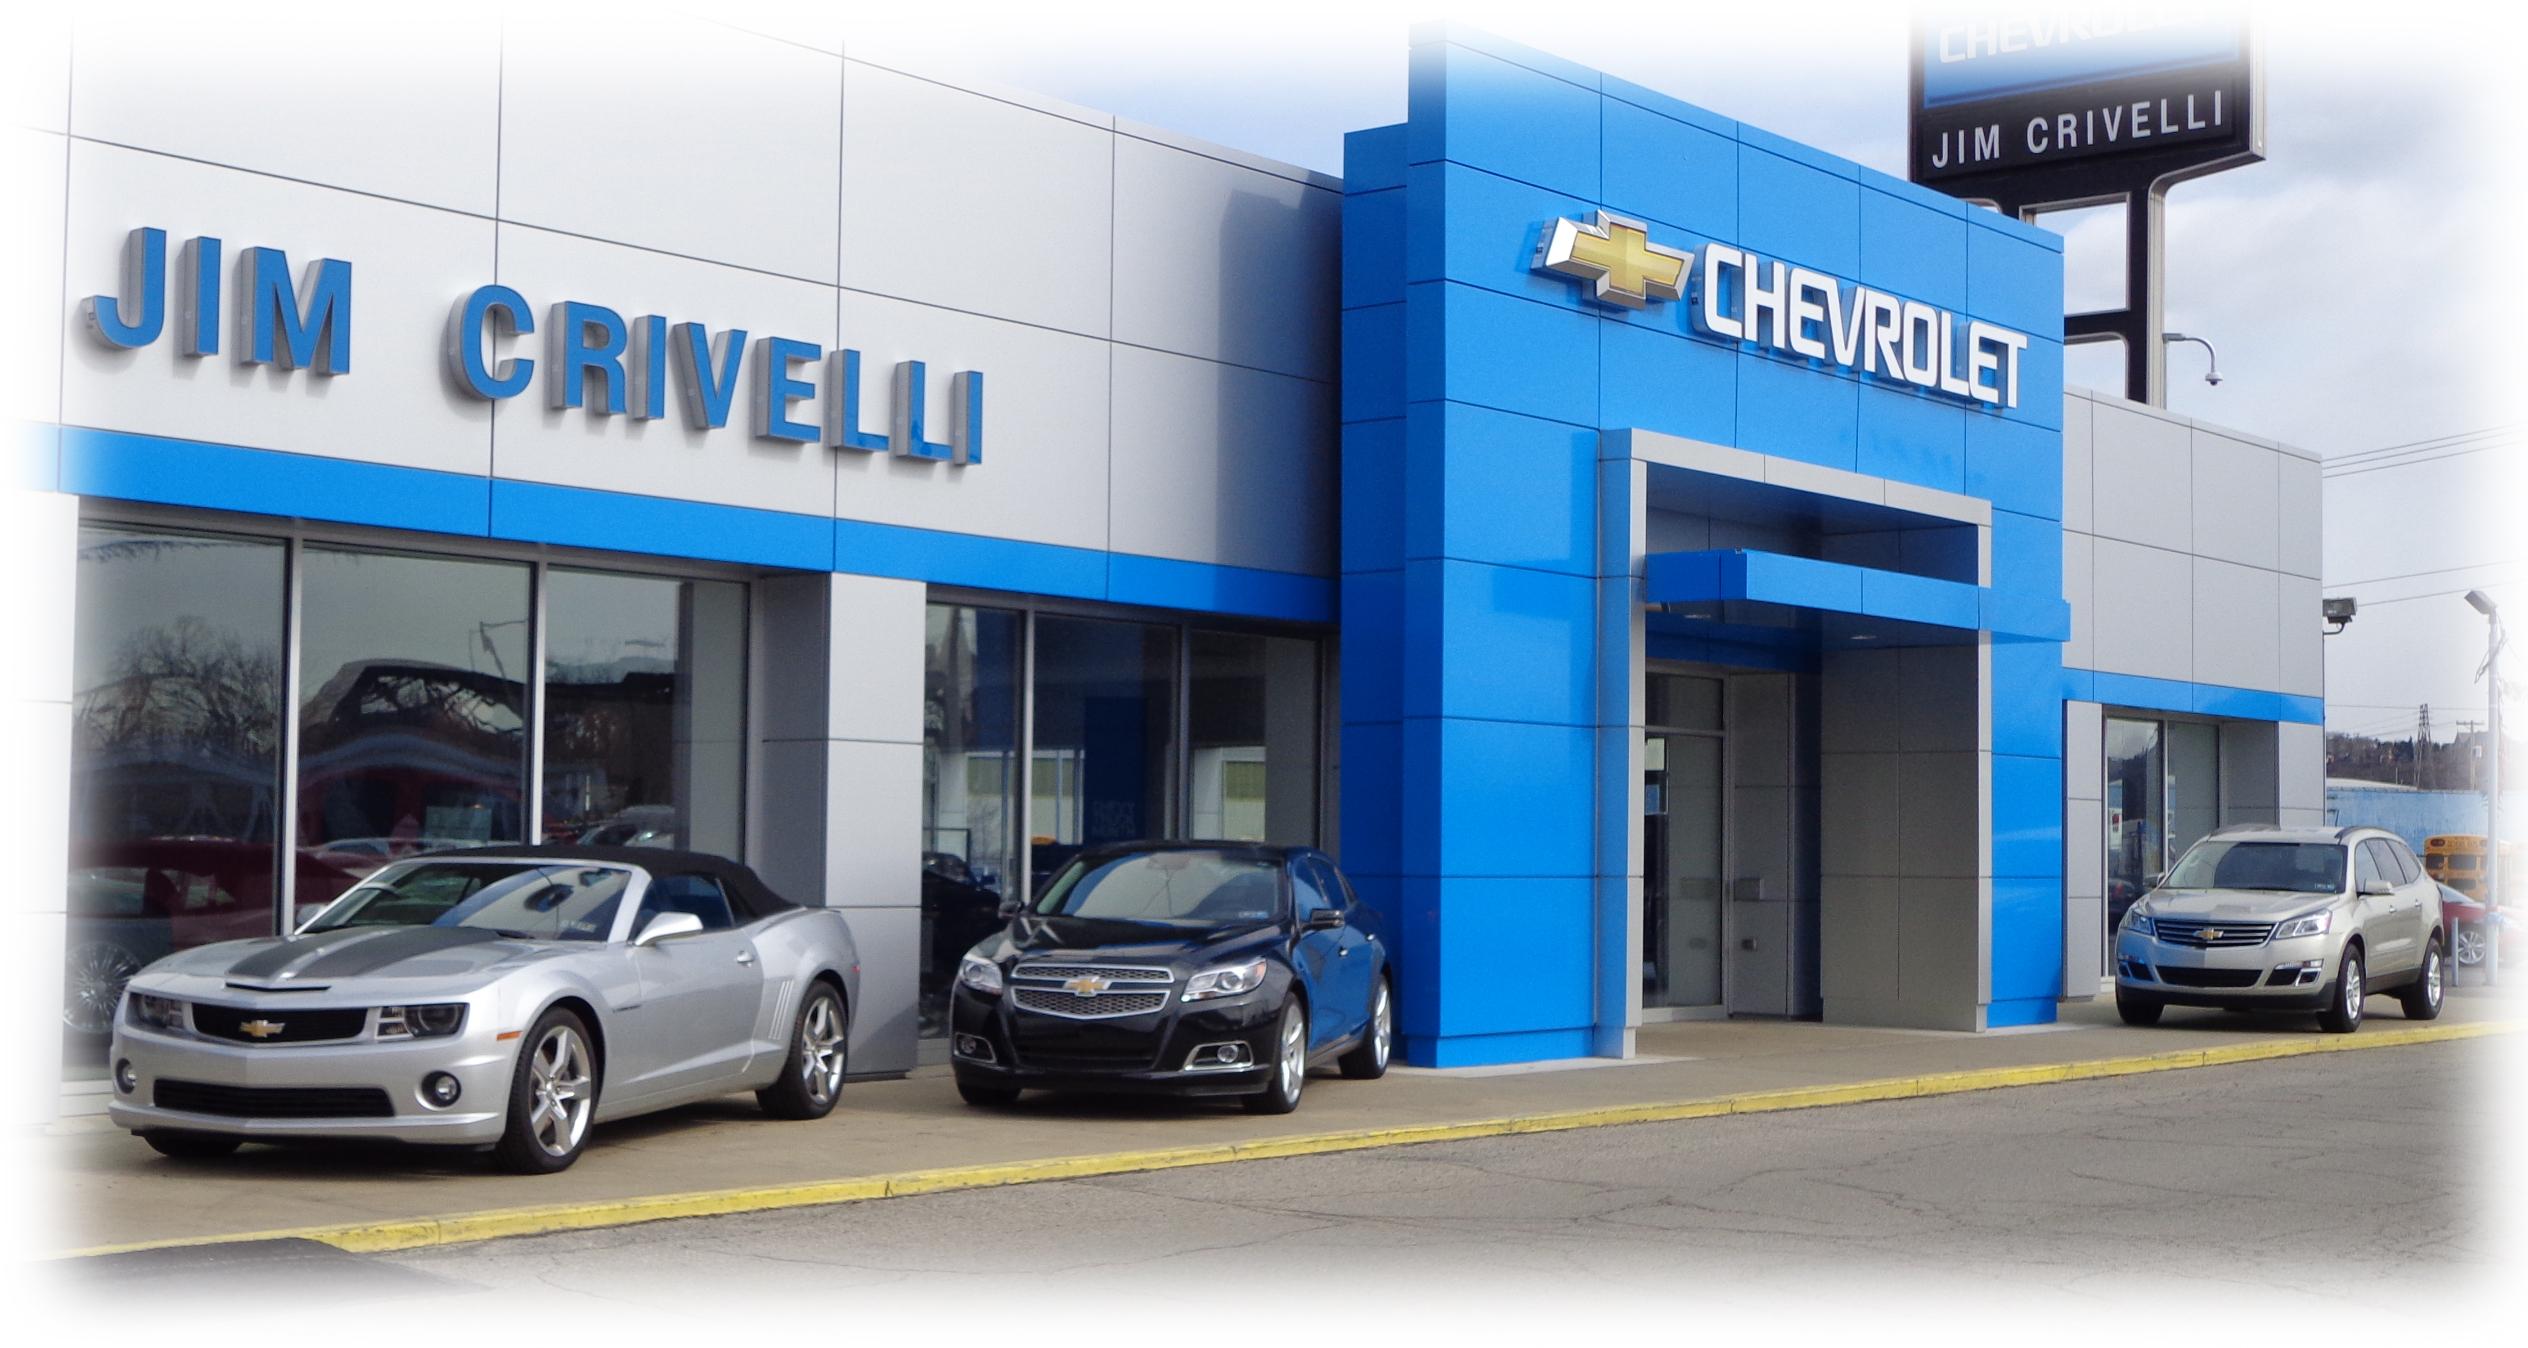 Jim Crivelli Chevrolet 108 Mckees Rocks Plz Mc Kees Rocks Pa 15136 Yp Com